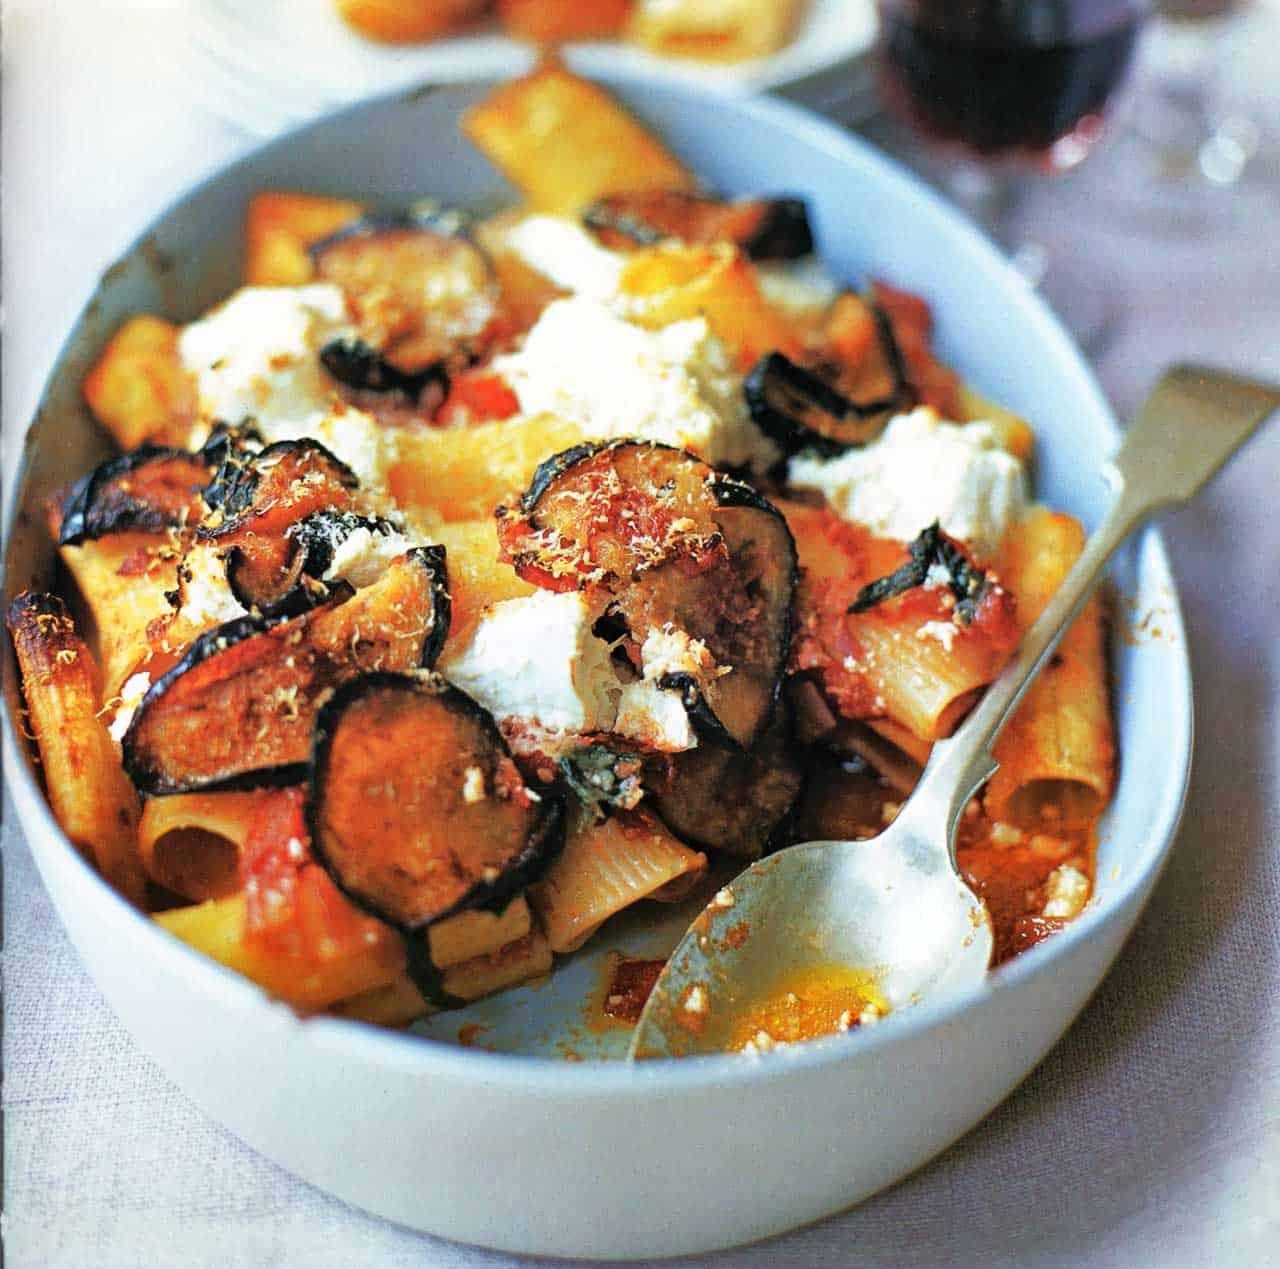 Baked Ziti With Eggplant Basil And Ricotta Recipe-baked ziti recipe www.eatopic.com